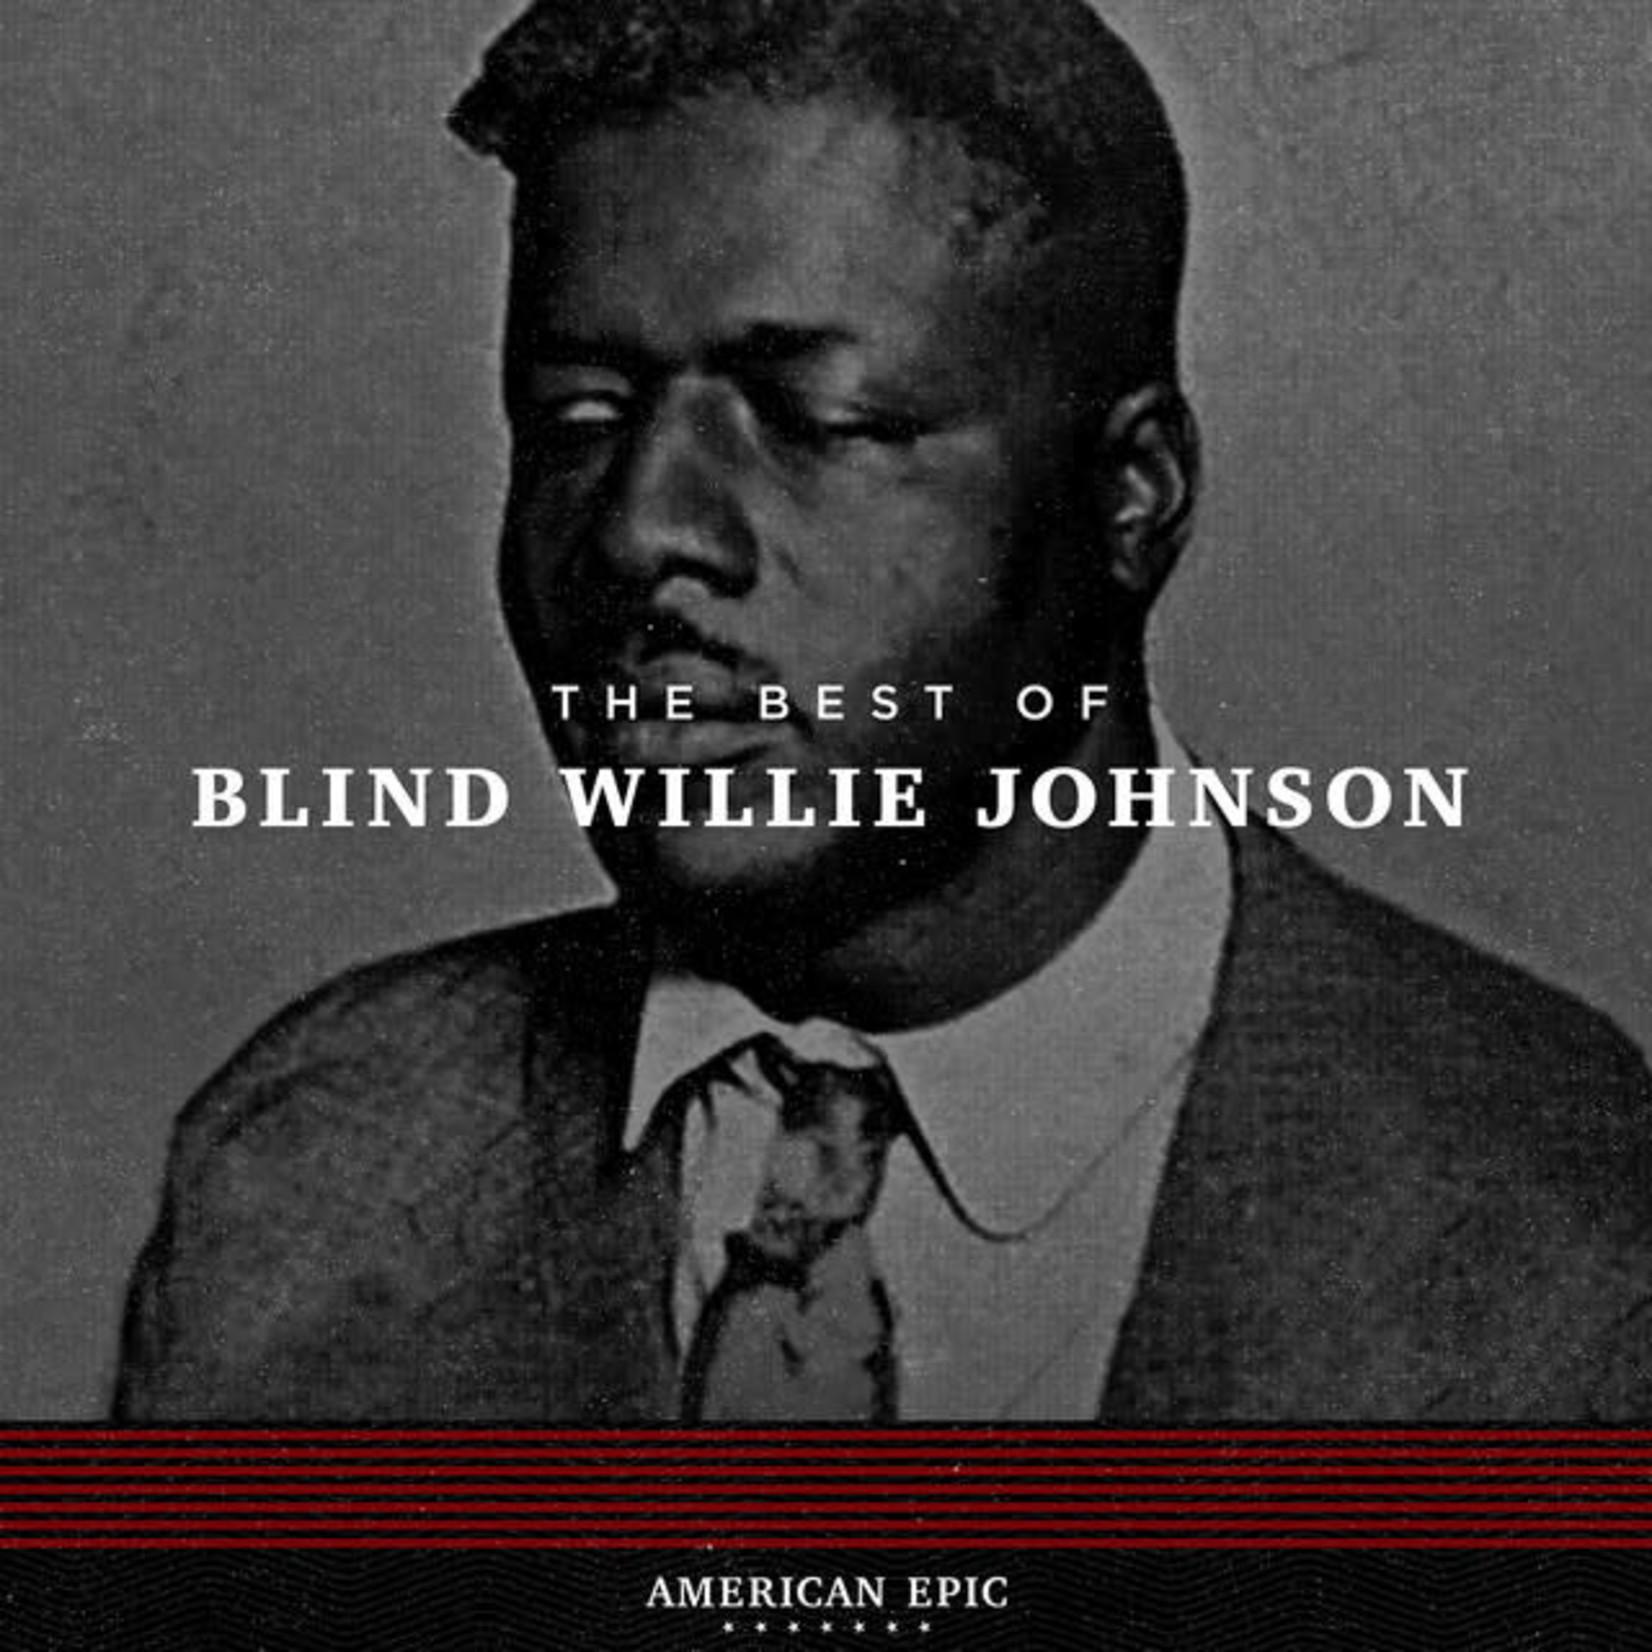 Vinyl Blind Willie Johnson - The Best Of.  Final sale